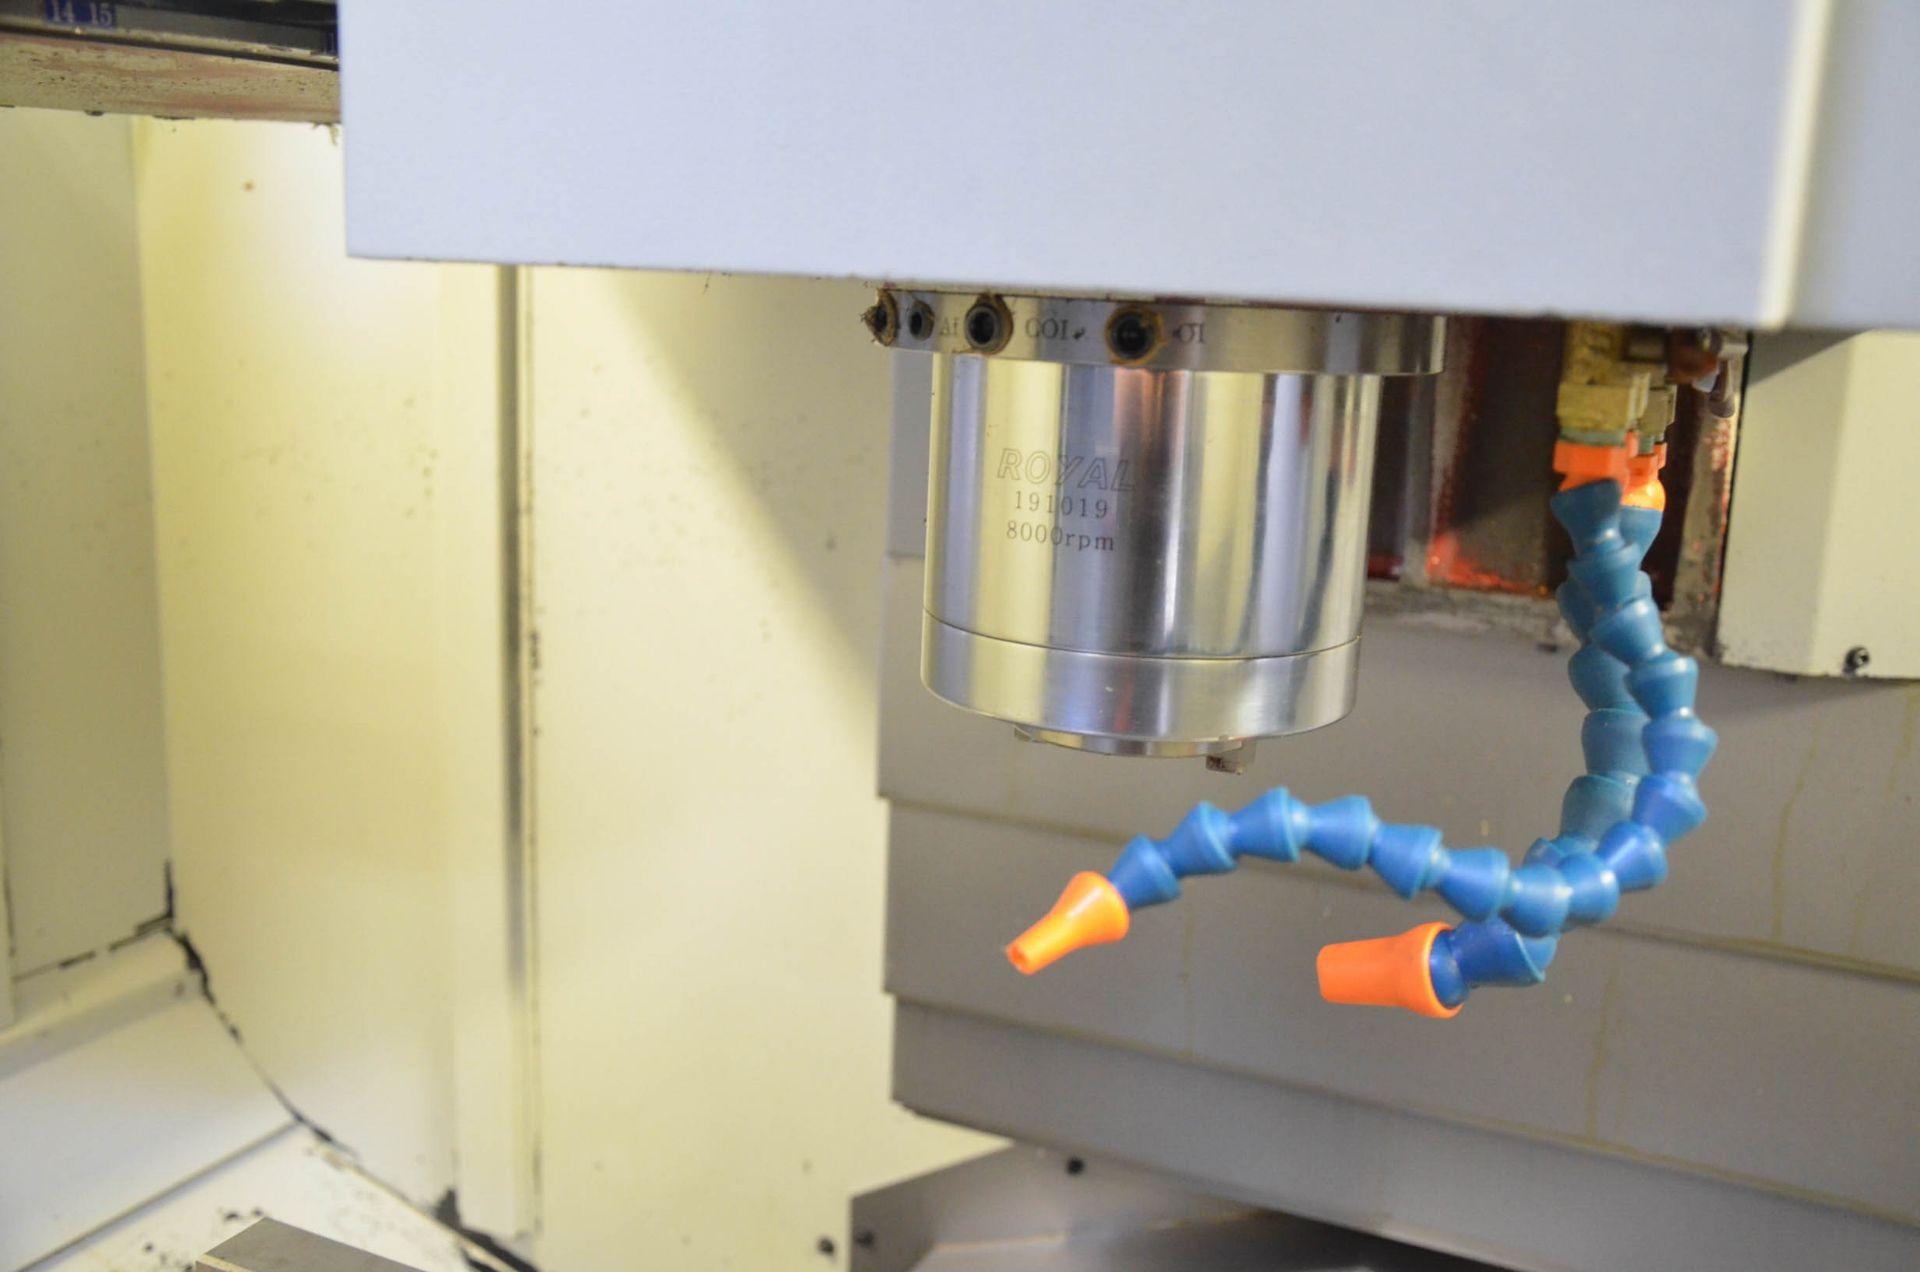 "SWI (2014) TRAK LPM CNC VERTICAL MACHINING CENTER WITH PROTO TRAK PMX CNC CONTROL, 19.5"" X 35.5"" - Image 8 of 9"